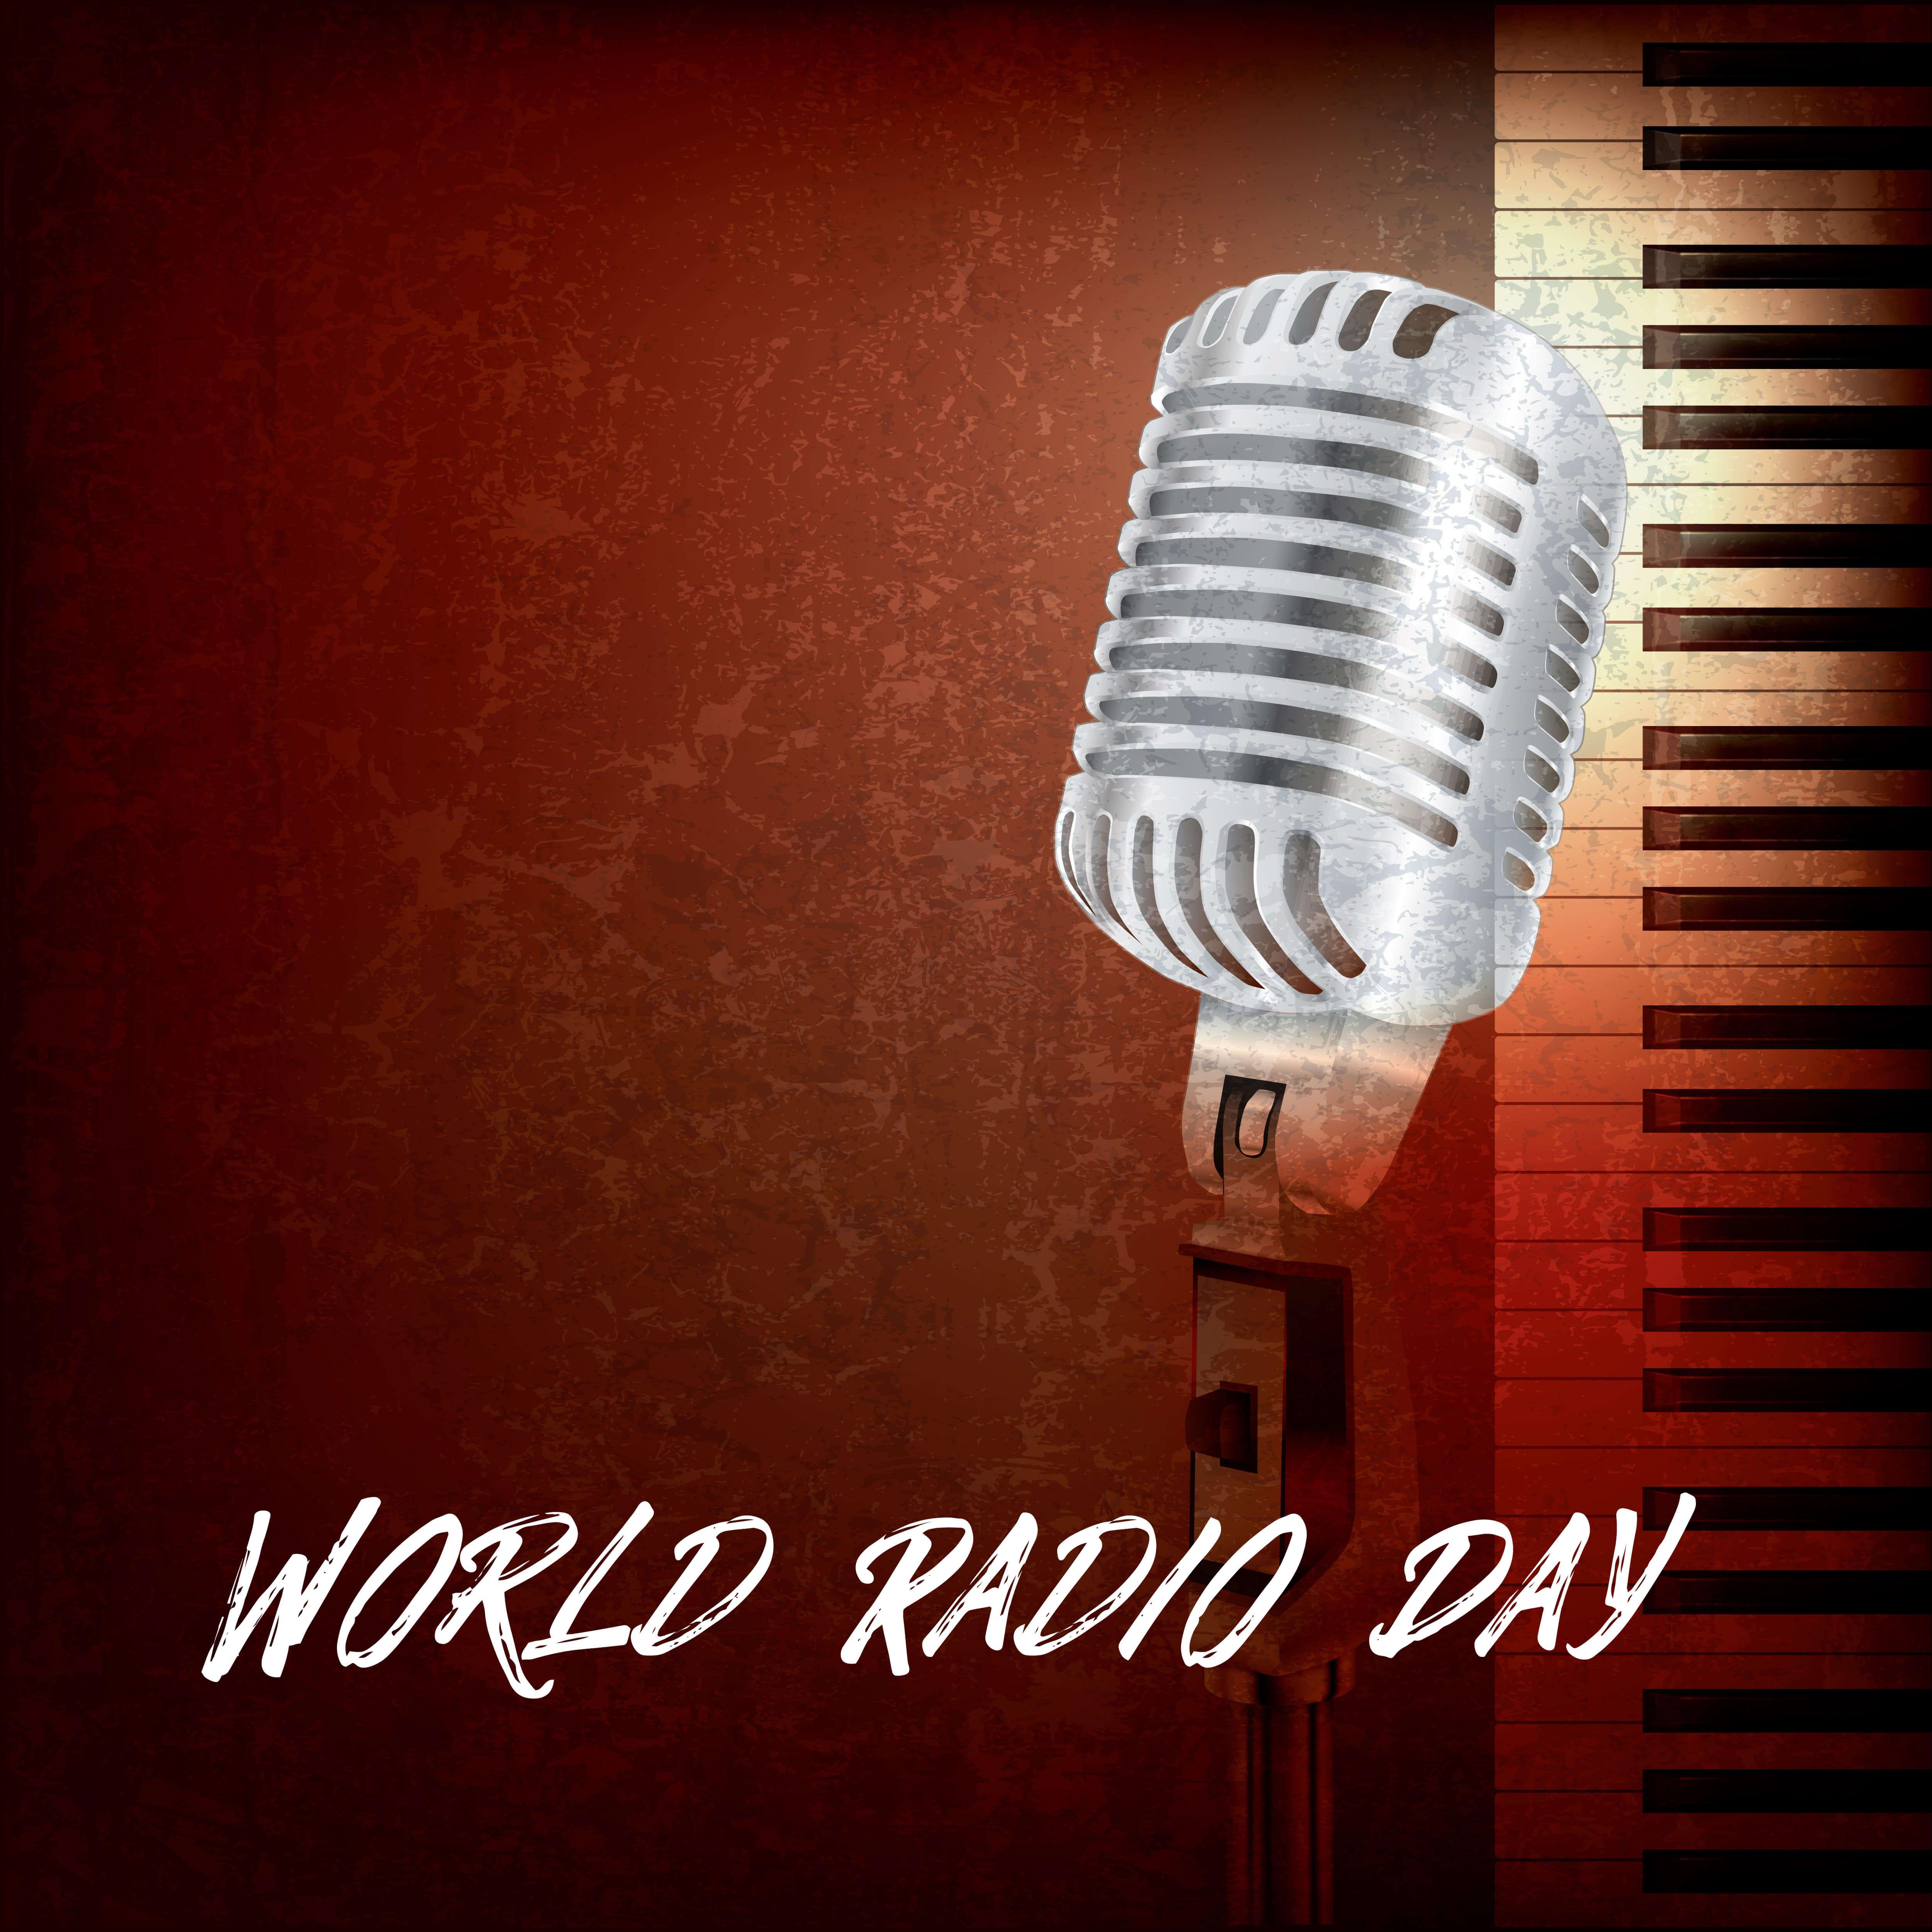 world radio day background pc hd wallpaper